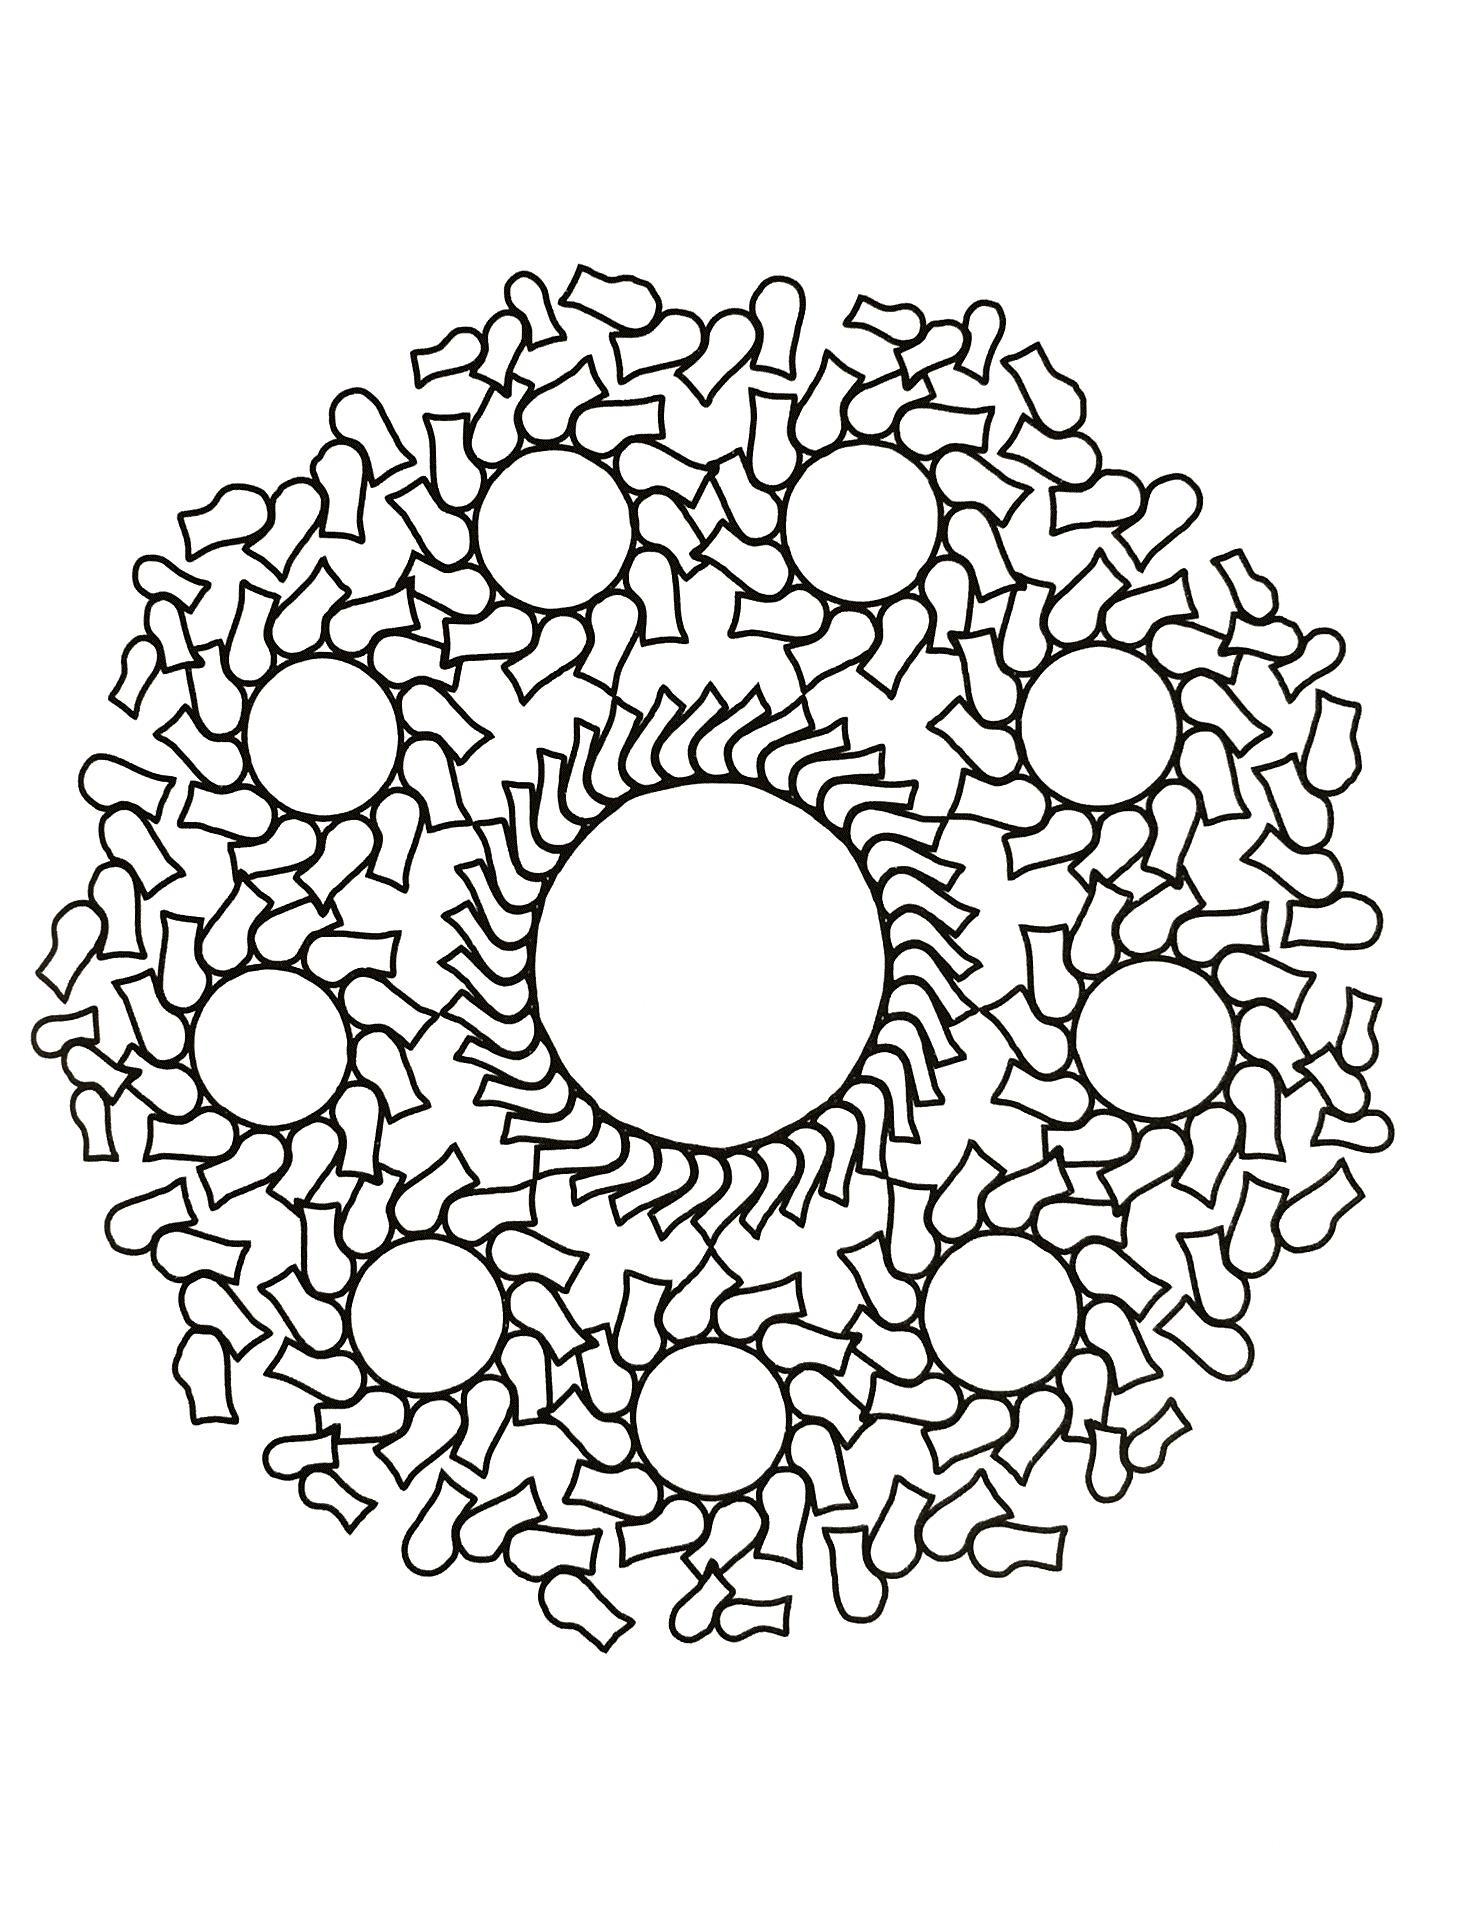 Mandala zen anti stress 16